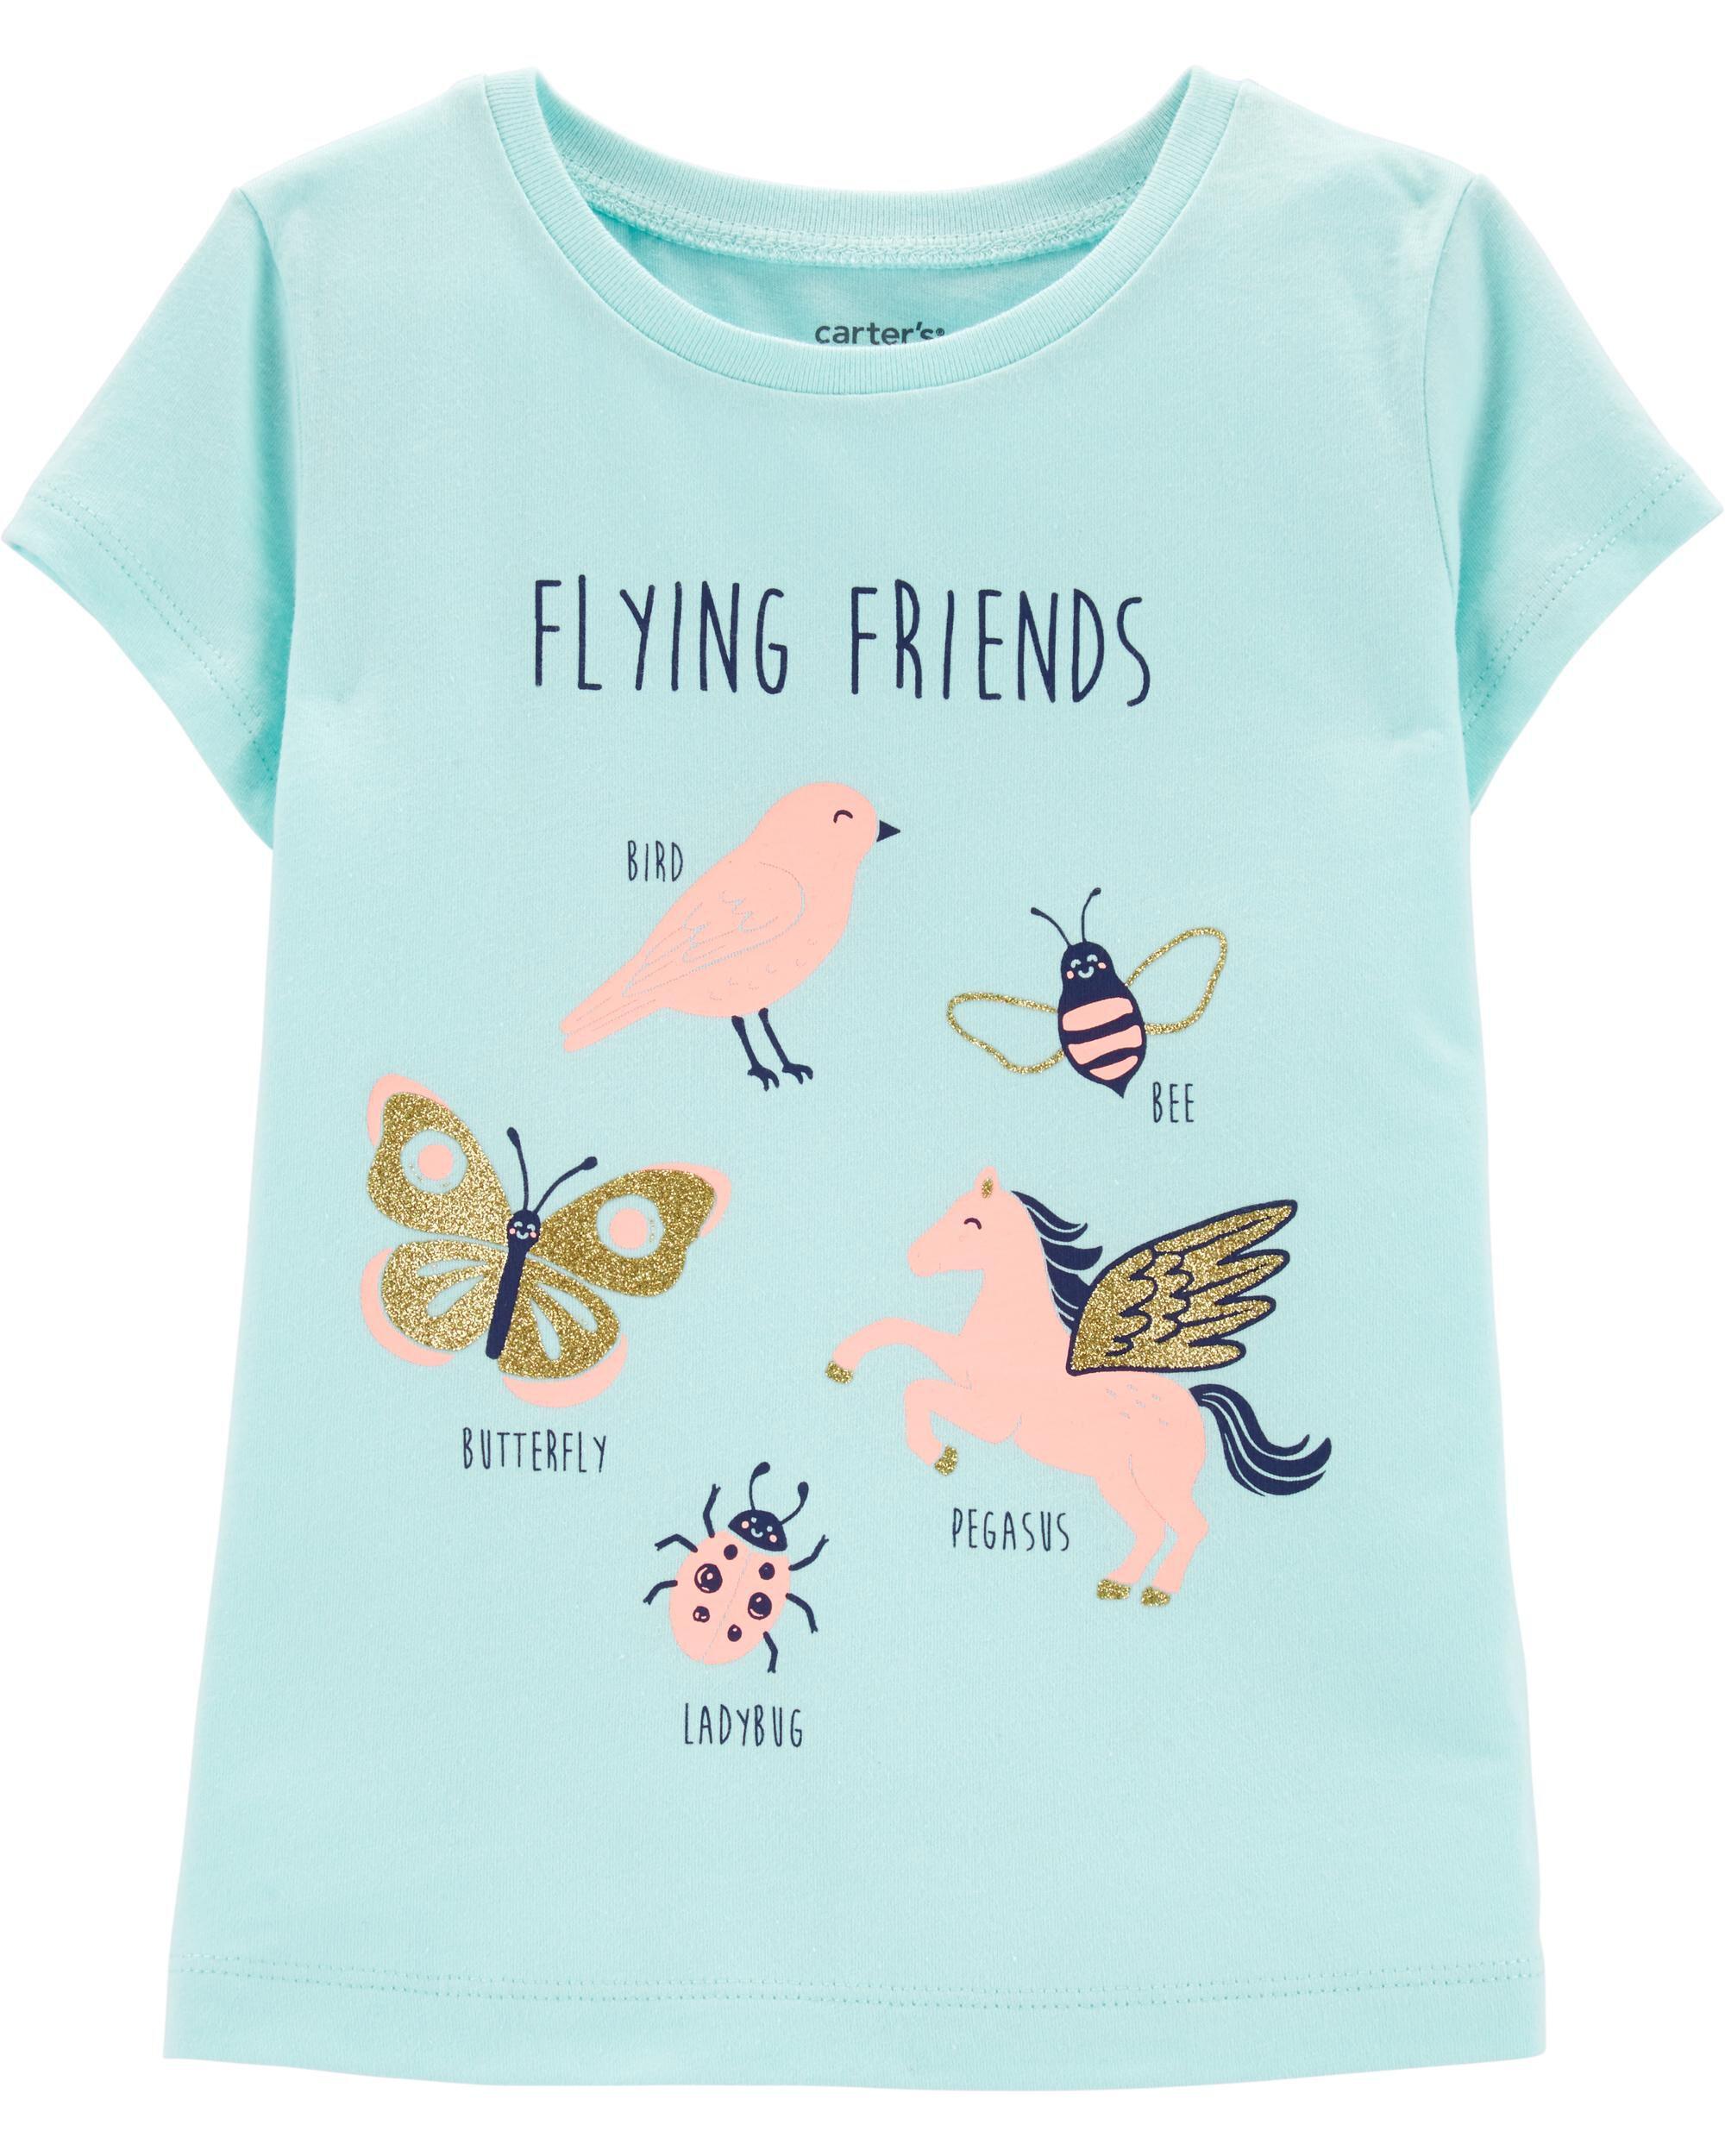 Happy Halloween Sparkly Owl Girls Long Sleeve Shirt 12 Or 24 Months Nwt Girls' Clothing (newborn-5t)